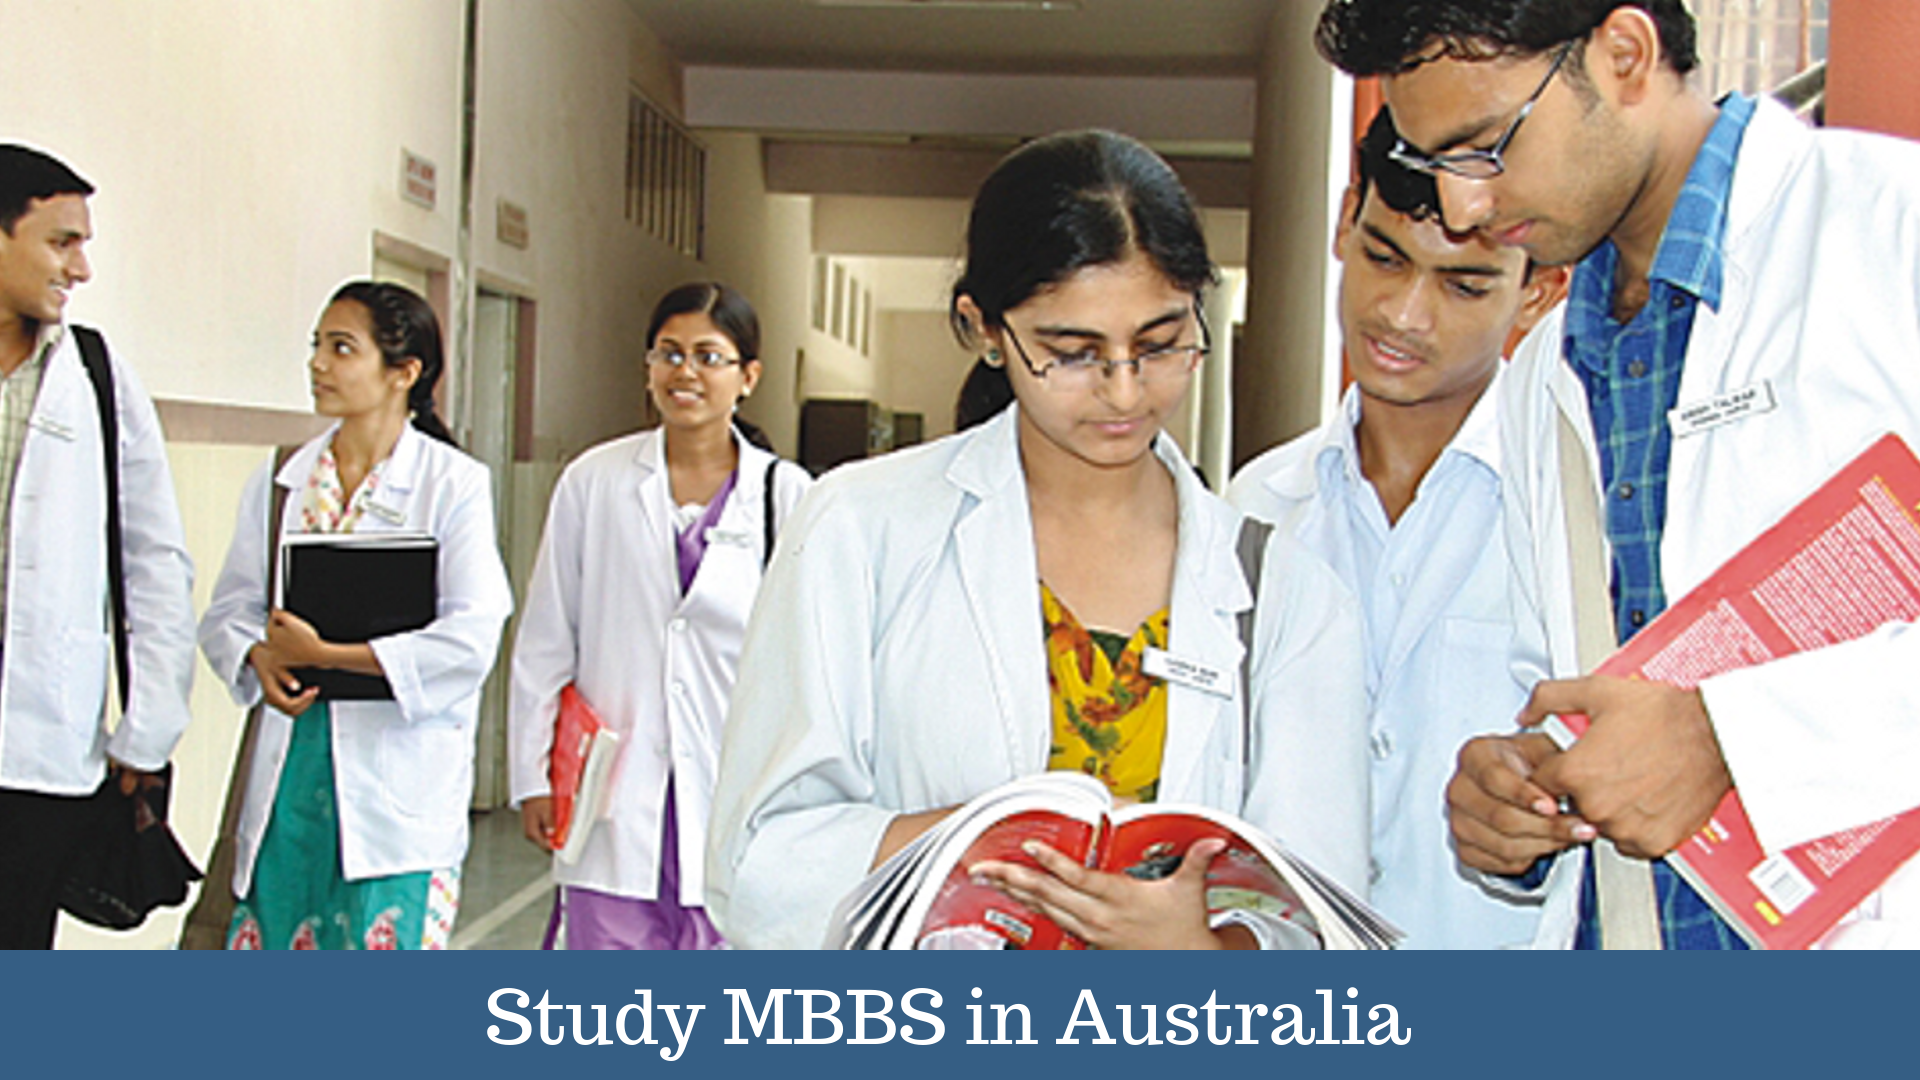 Study MBBS in Australia